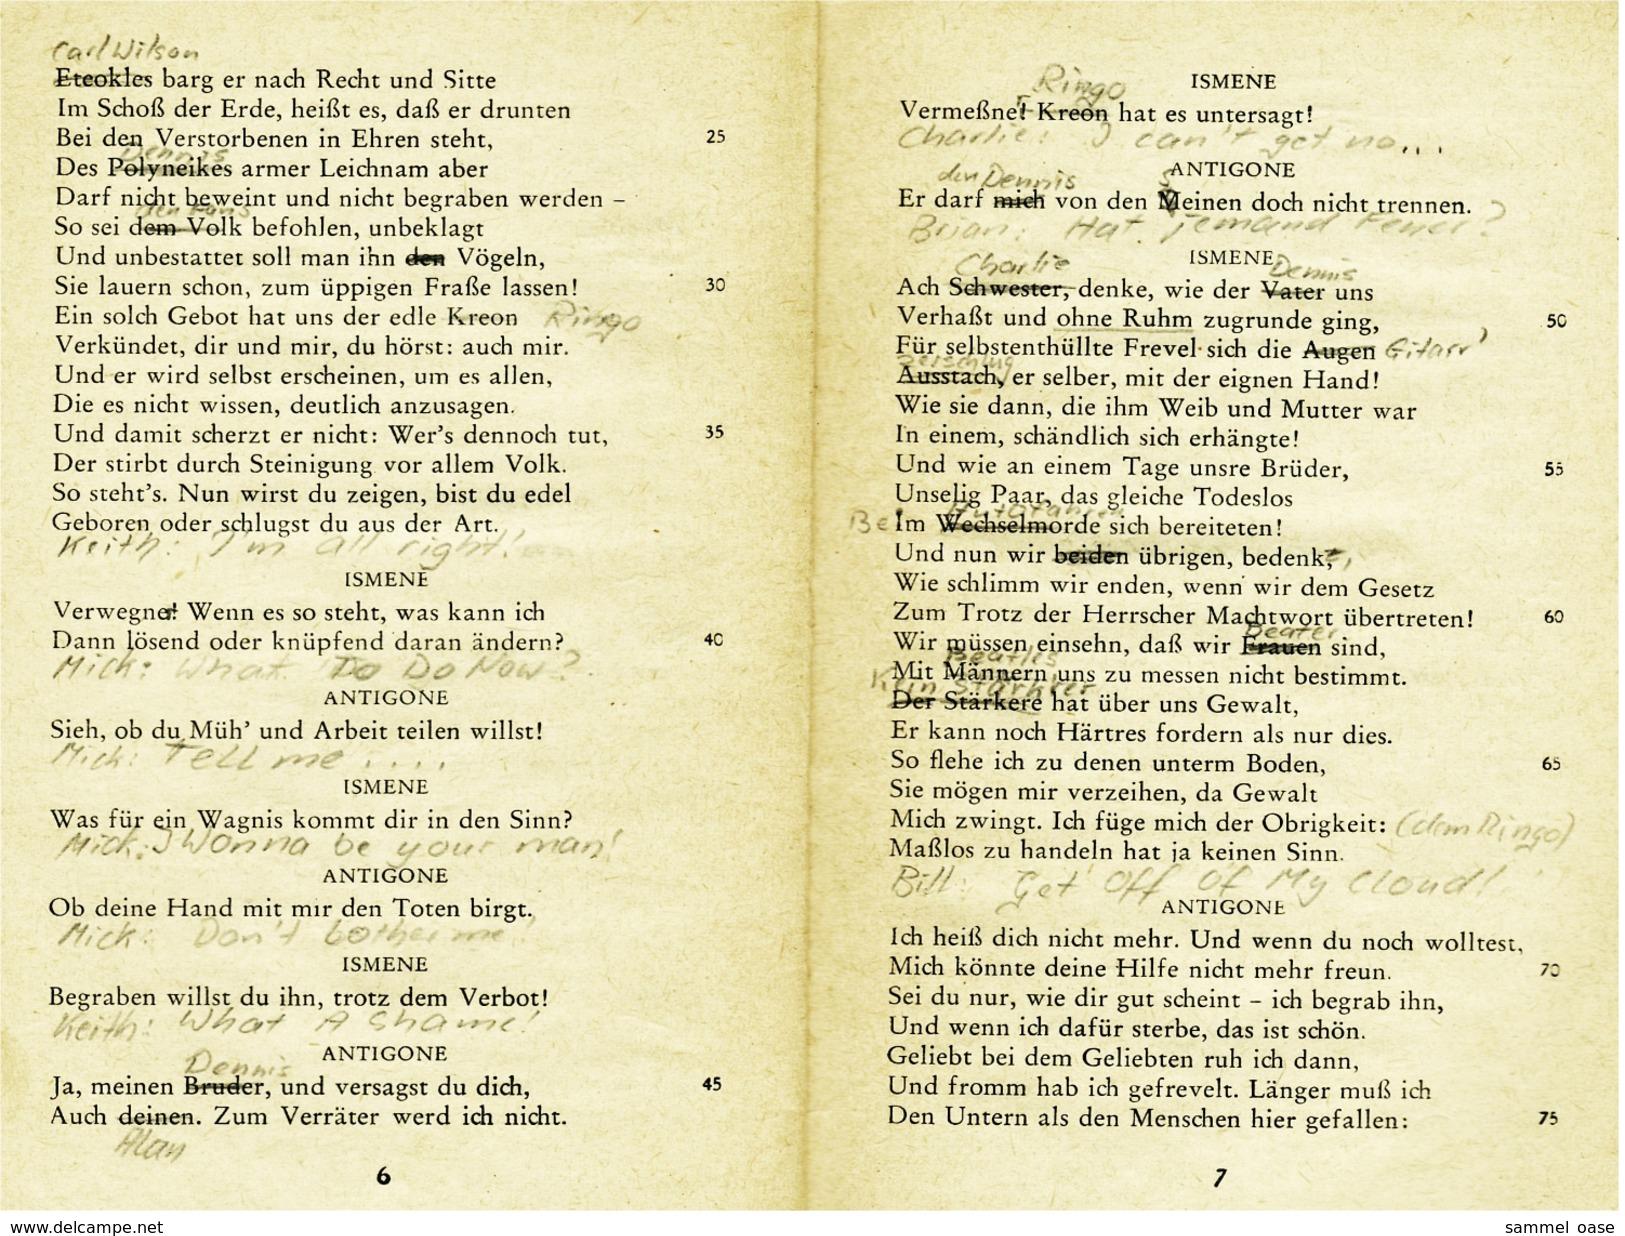 Reclam Heft  -  Antigone Tragödie  -  Von Sophokles  -  1966 - Theatre & Scripts